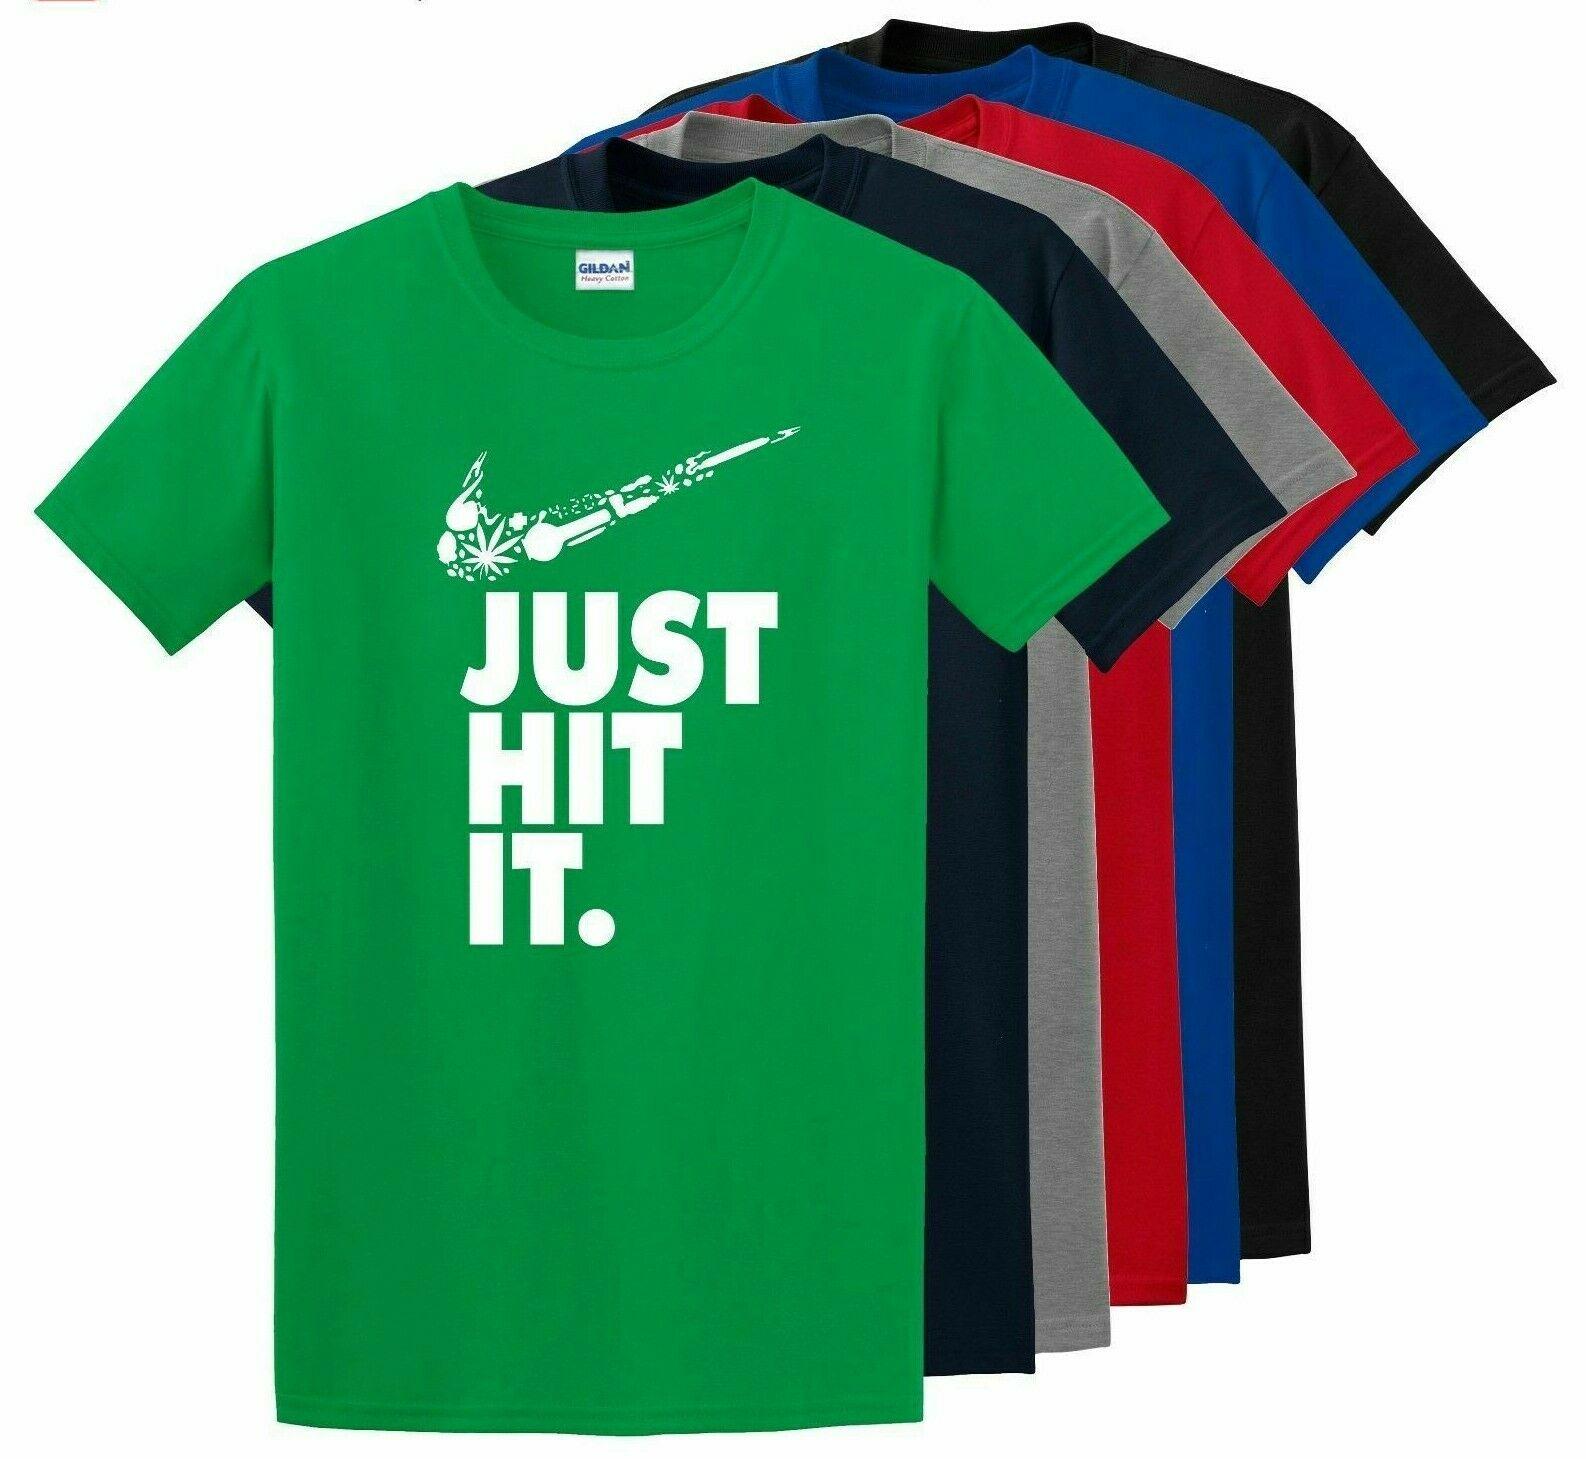 Nike Just Hit Funny Marijuana Weed Pot 420 Black T Shirt Just do it Festival Tee 1